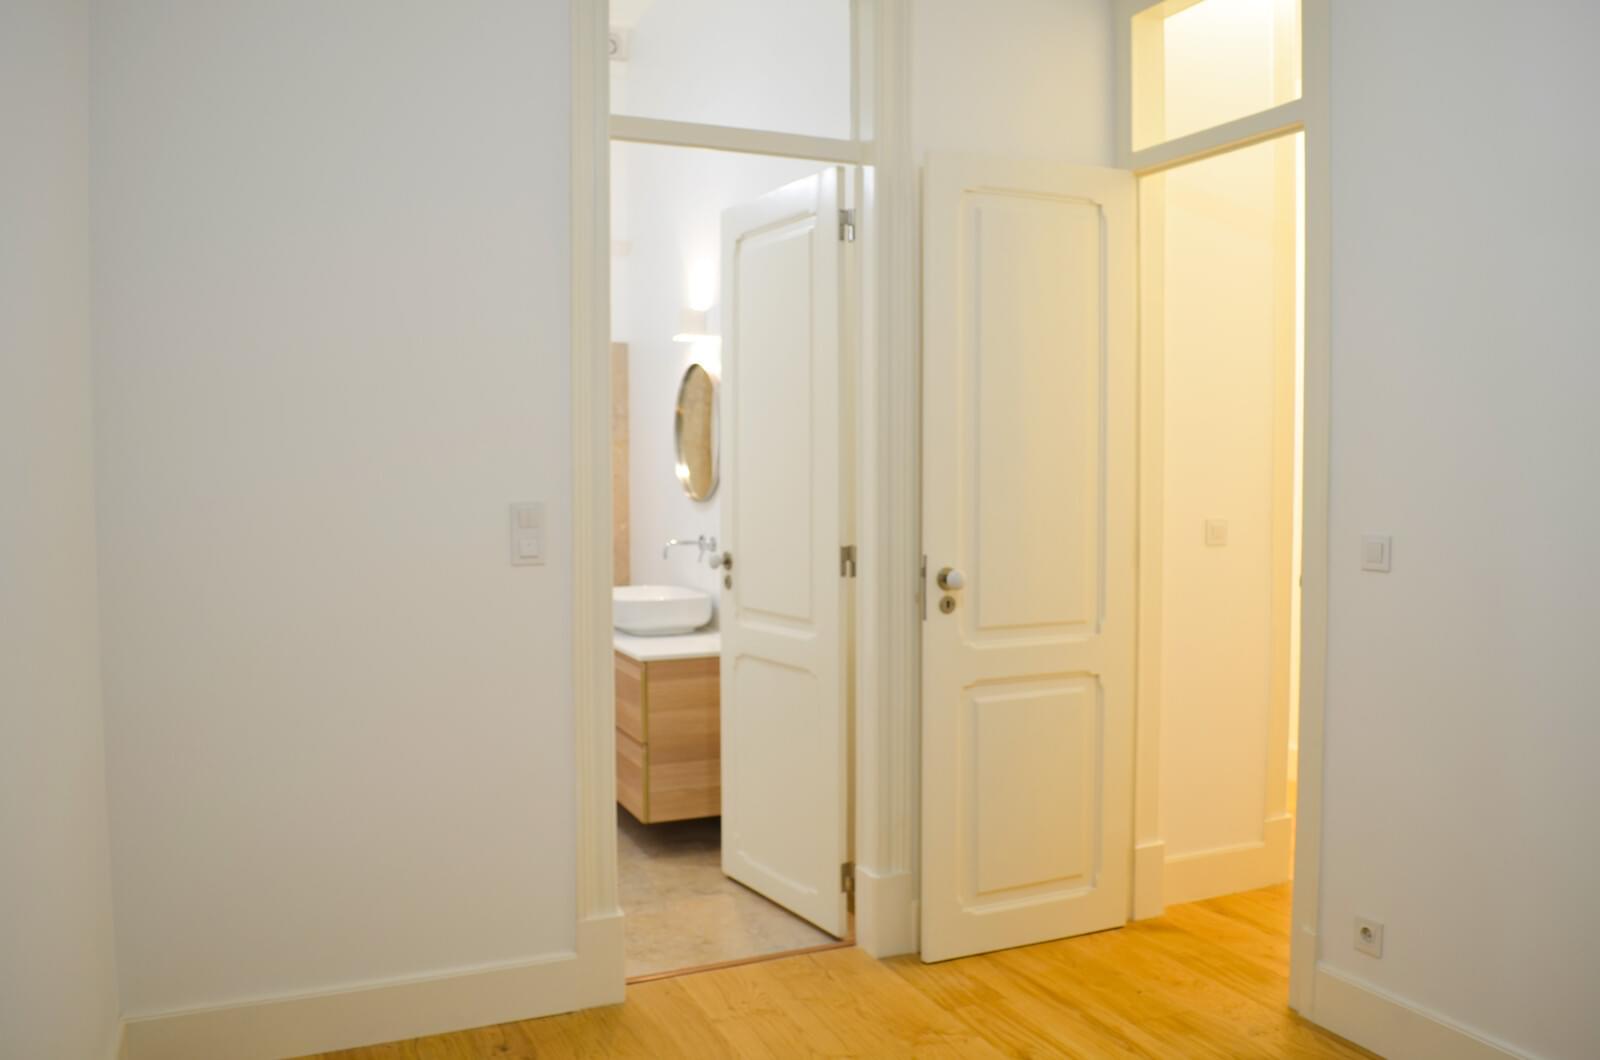 pf18801-apartamento-t2-lisboa-ca45822e-9626-4937-bfde-36b8f9675e04